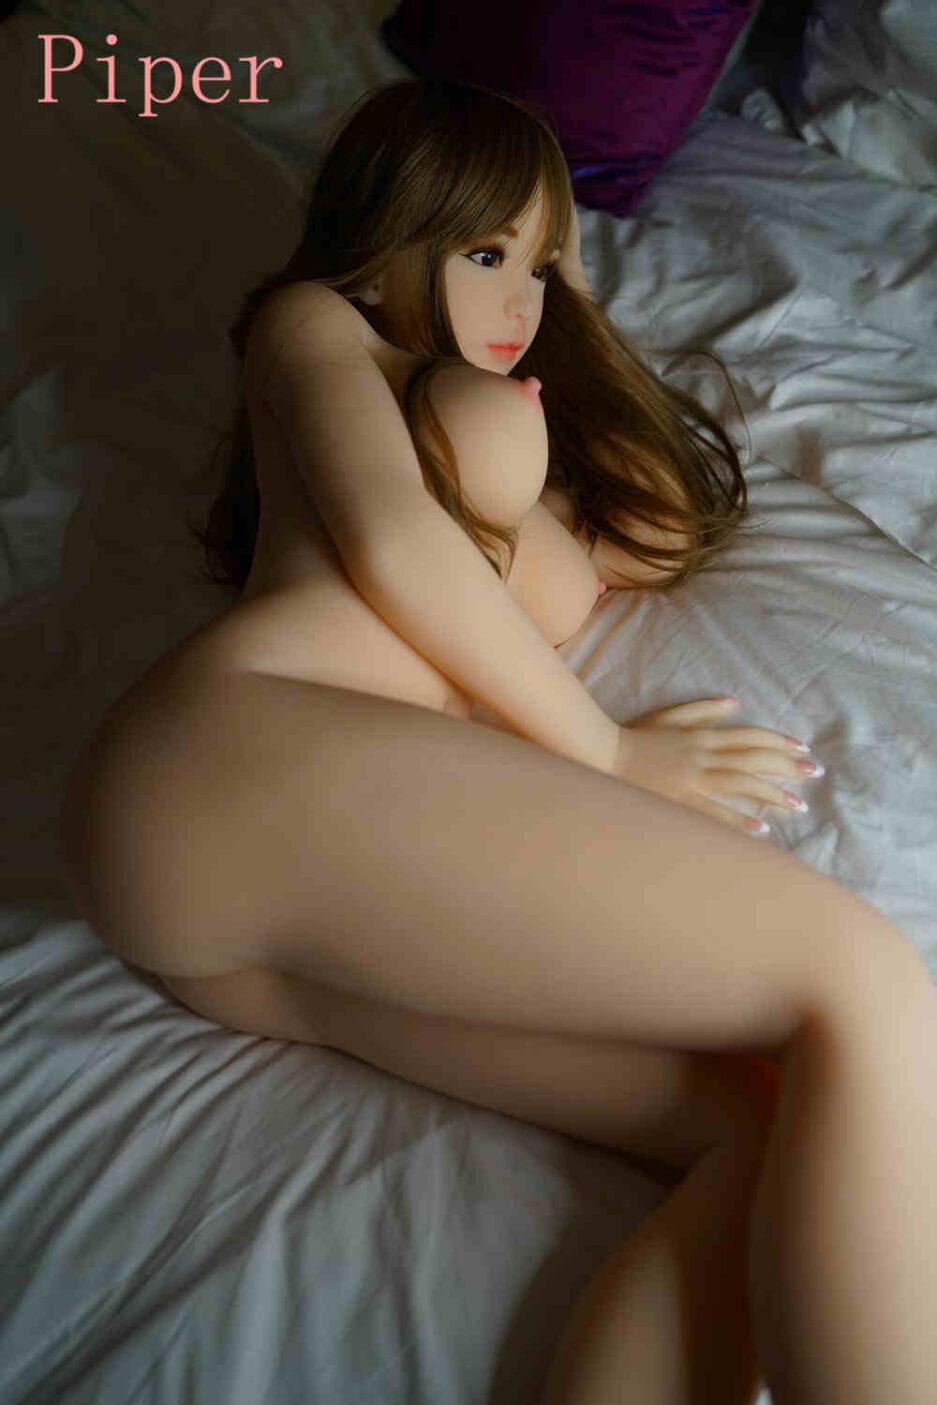 Sex doll lying sideways on the bed